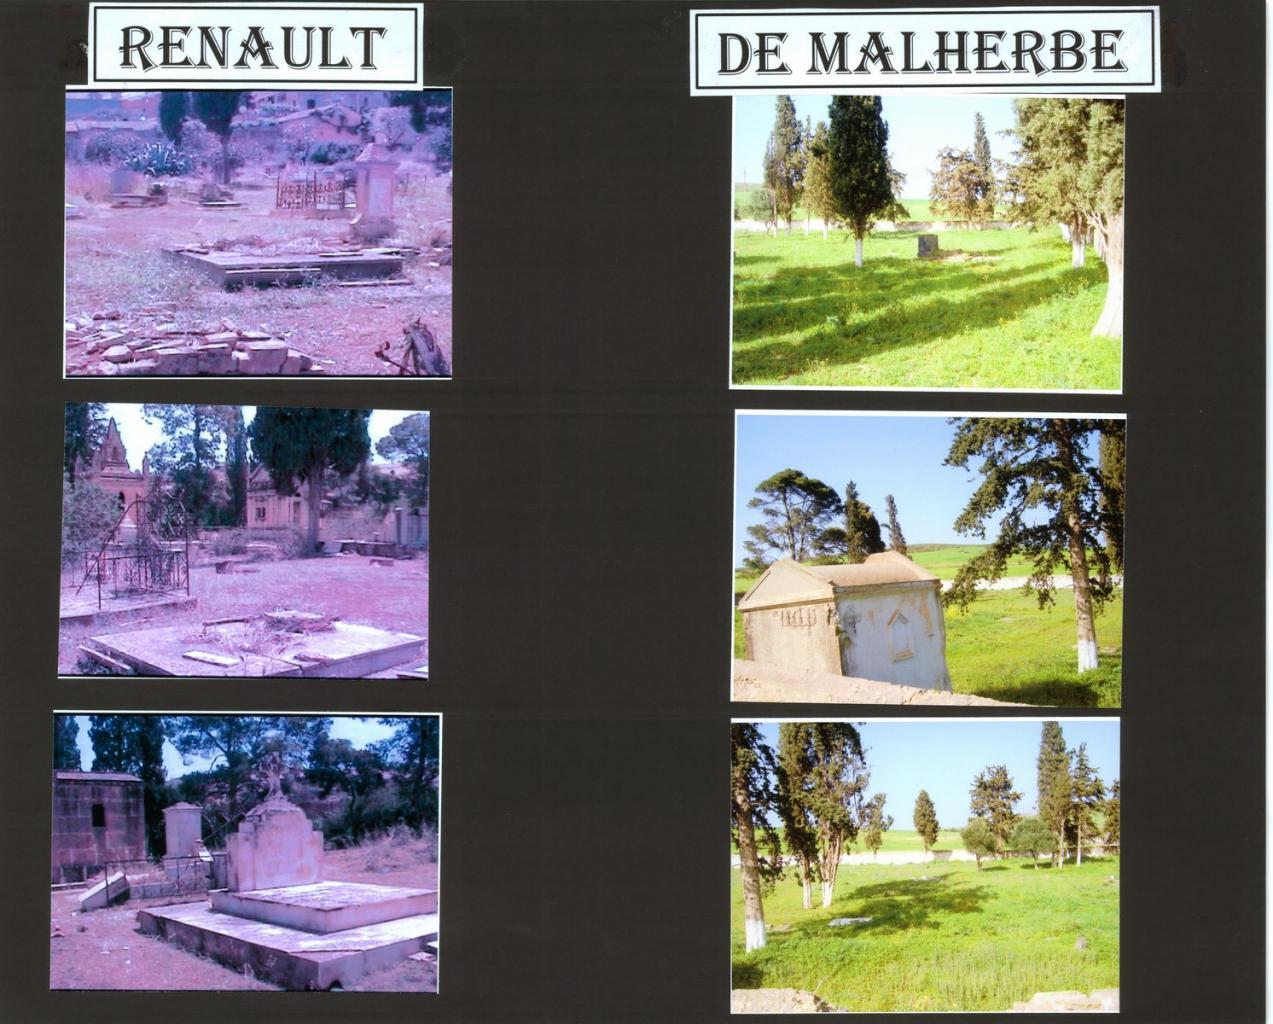 Renault de Malherbe